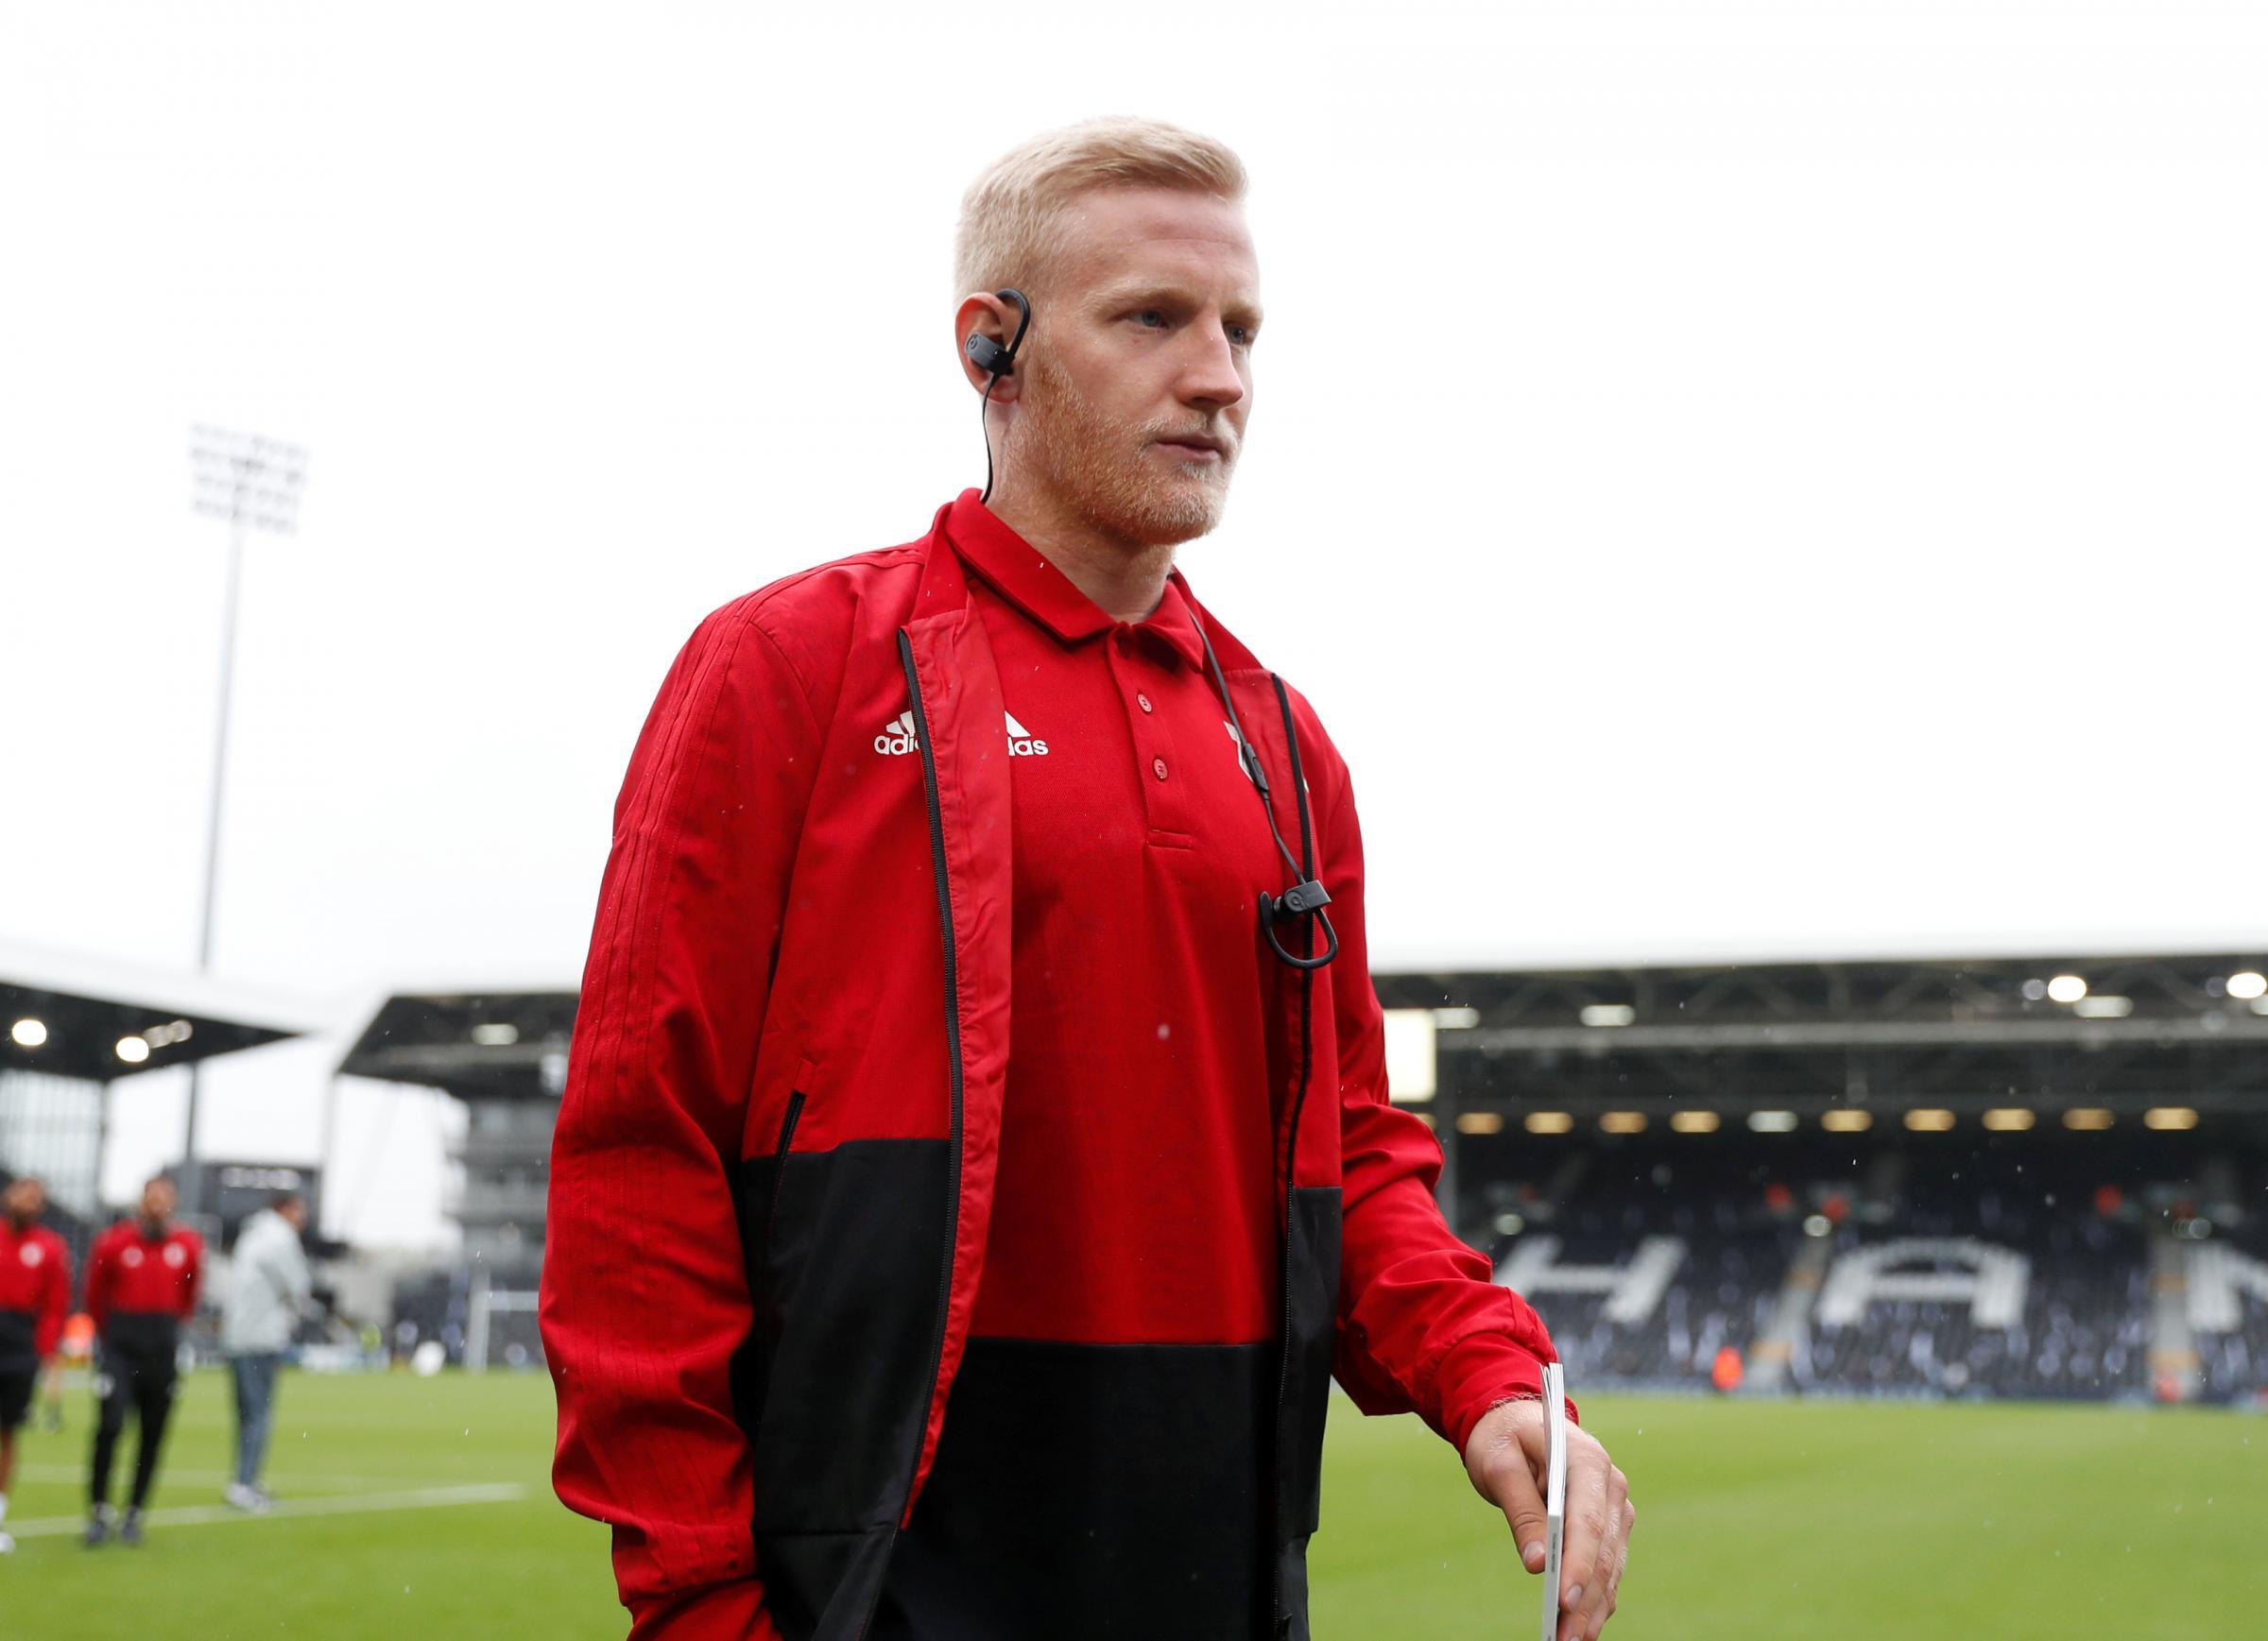 Dele Alli Captain - Tottenham Hotspur Team vs Watford Confirmed